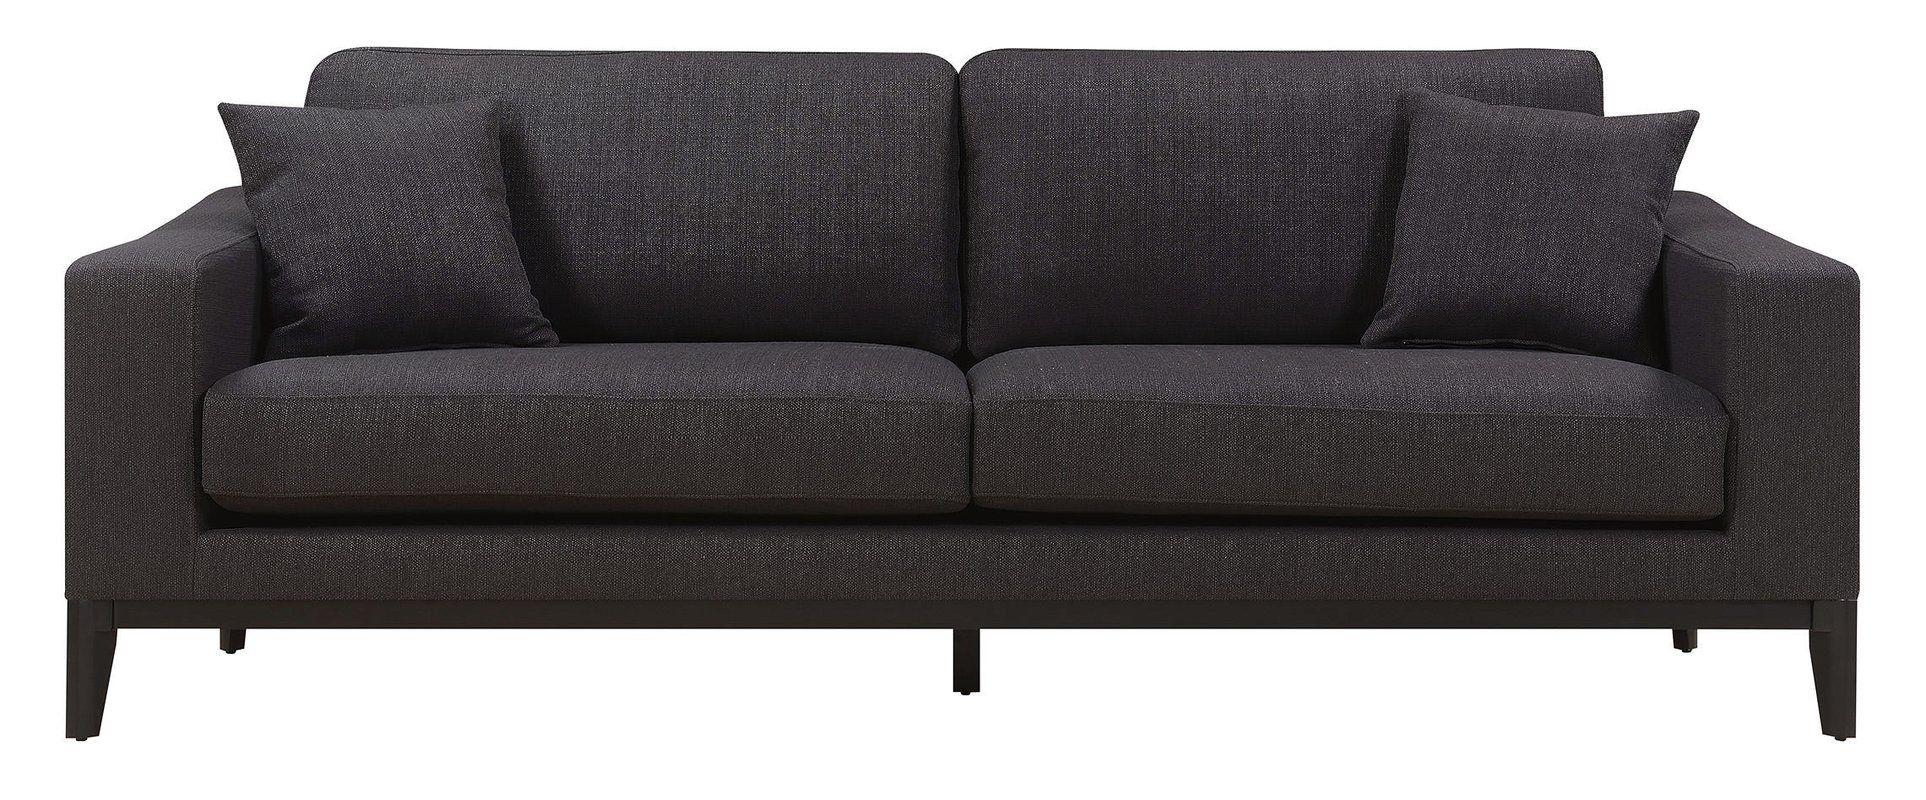 "Olivia Canvas 86"" Square Arm Sofa | Elle decor, Furniture ..."